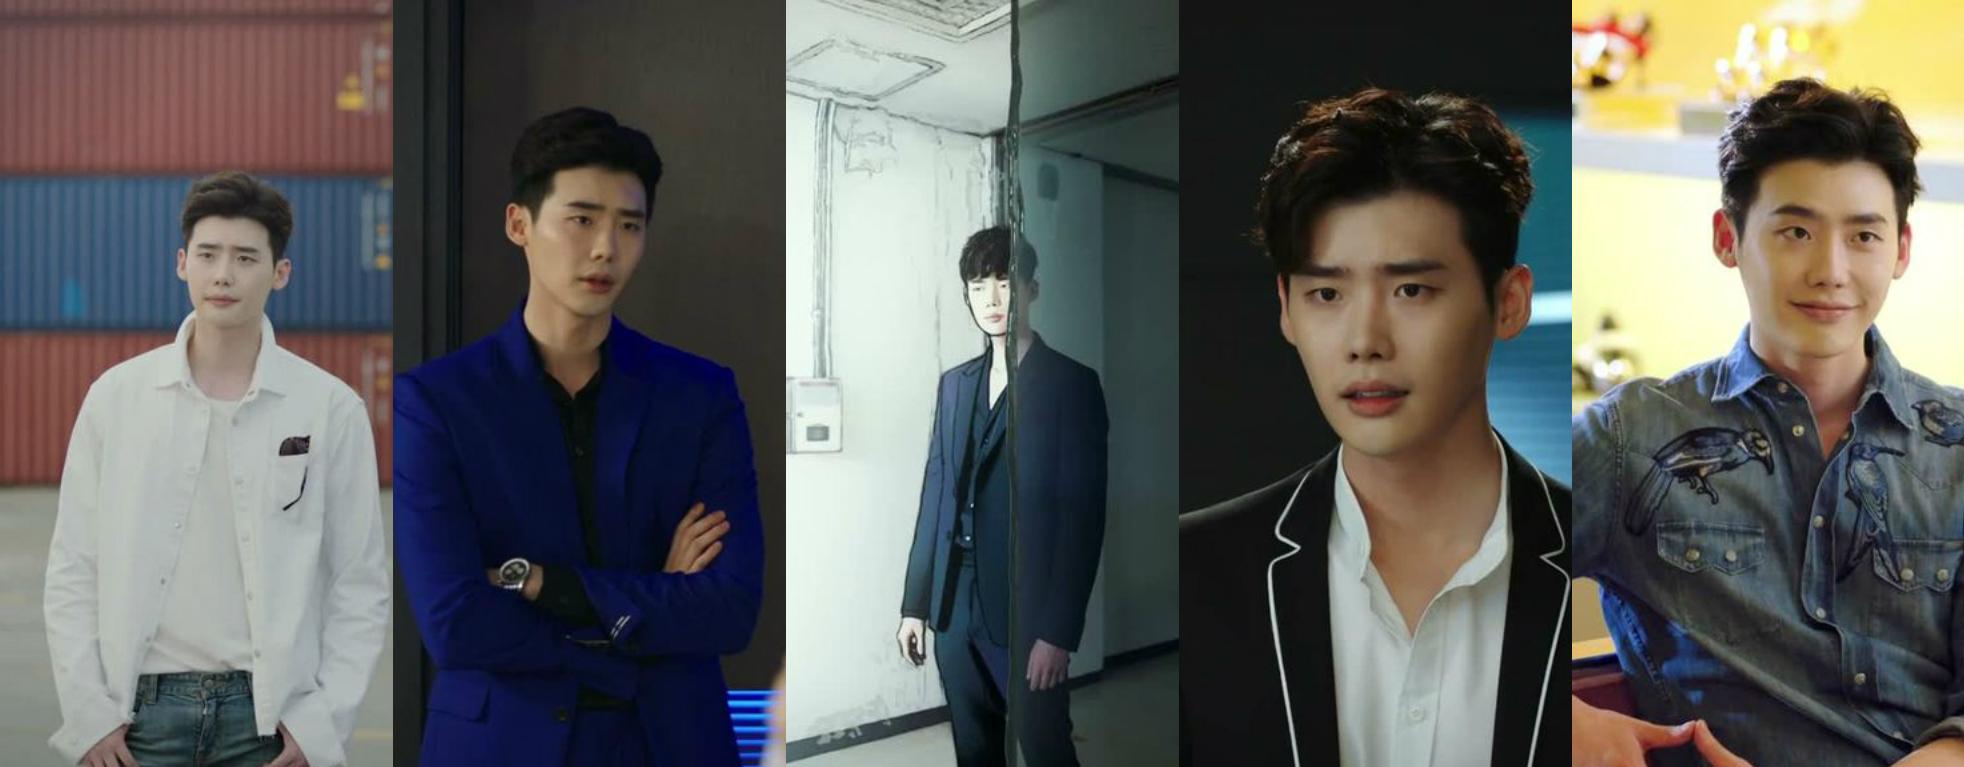 Kang Chul Fashion